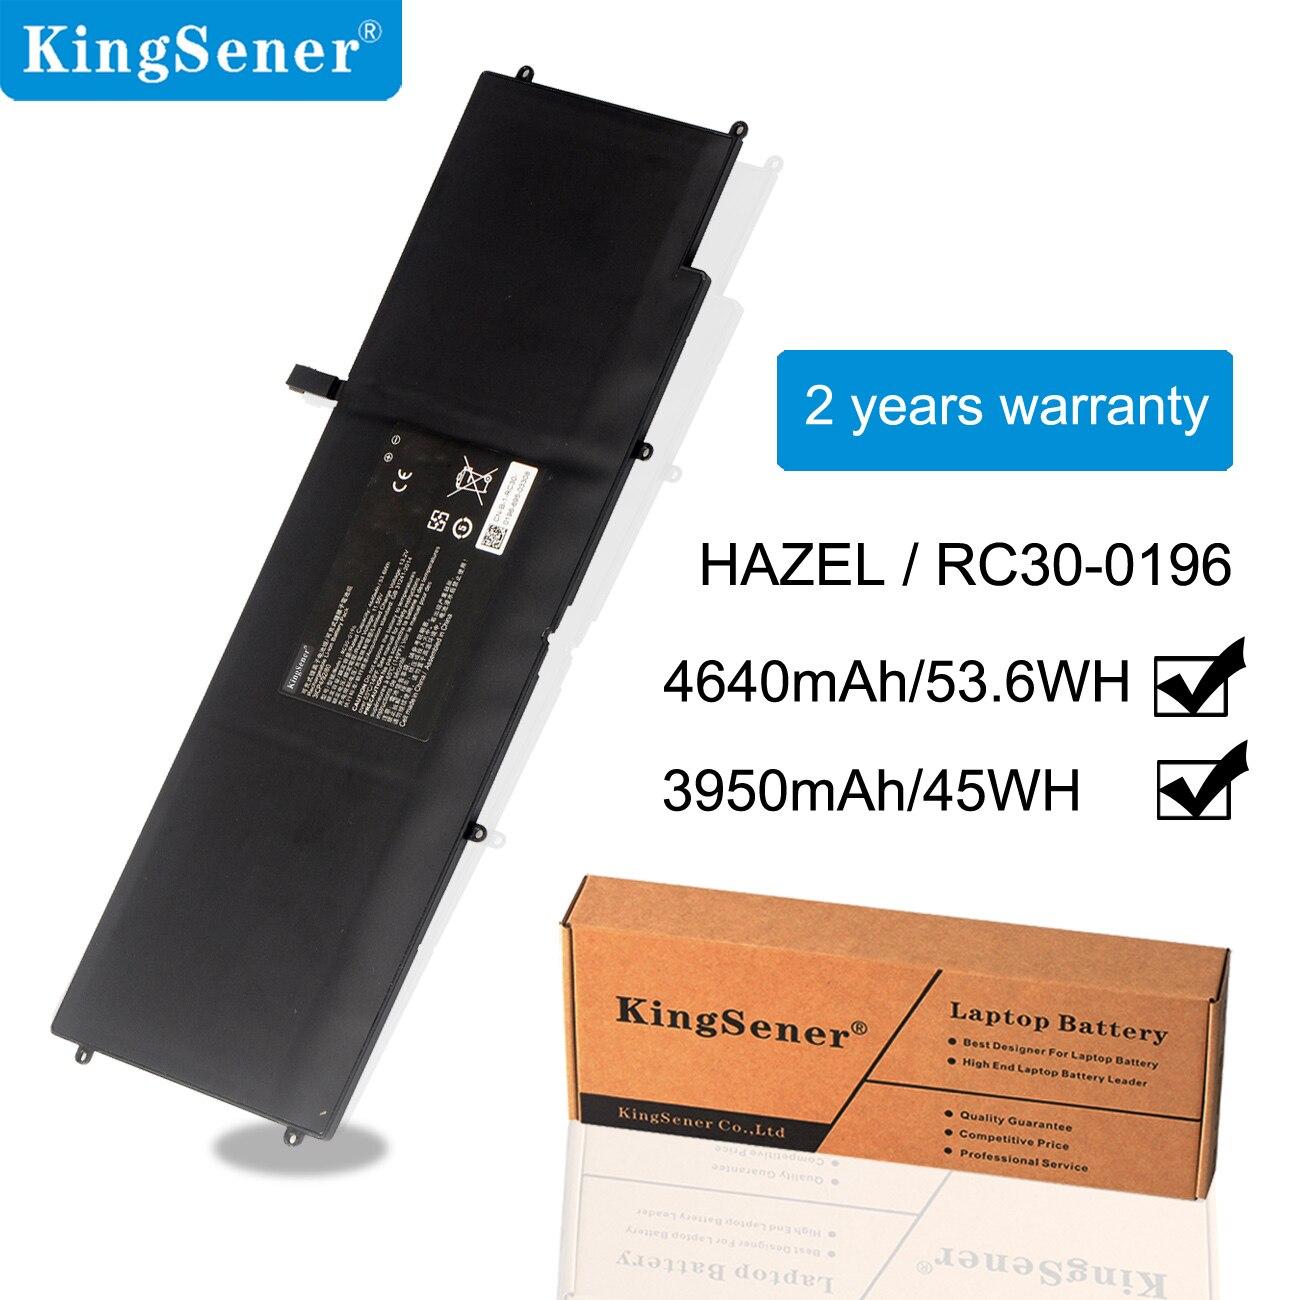 Kingsener HAZEL RC30-0196 RZ09-0196 Laptop Battery For Razer Blade Stealth 2016 V2 I7-7500U 13.3